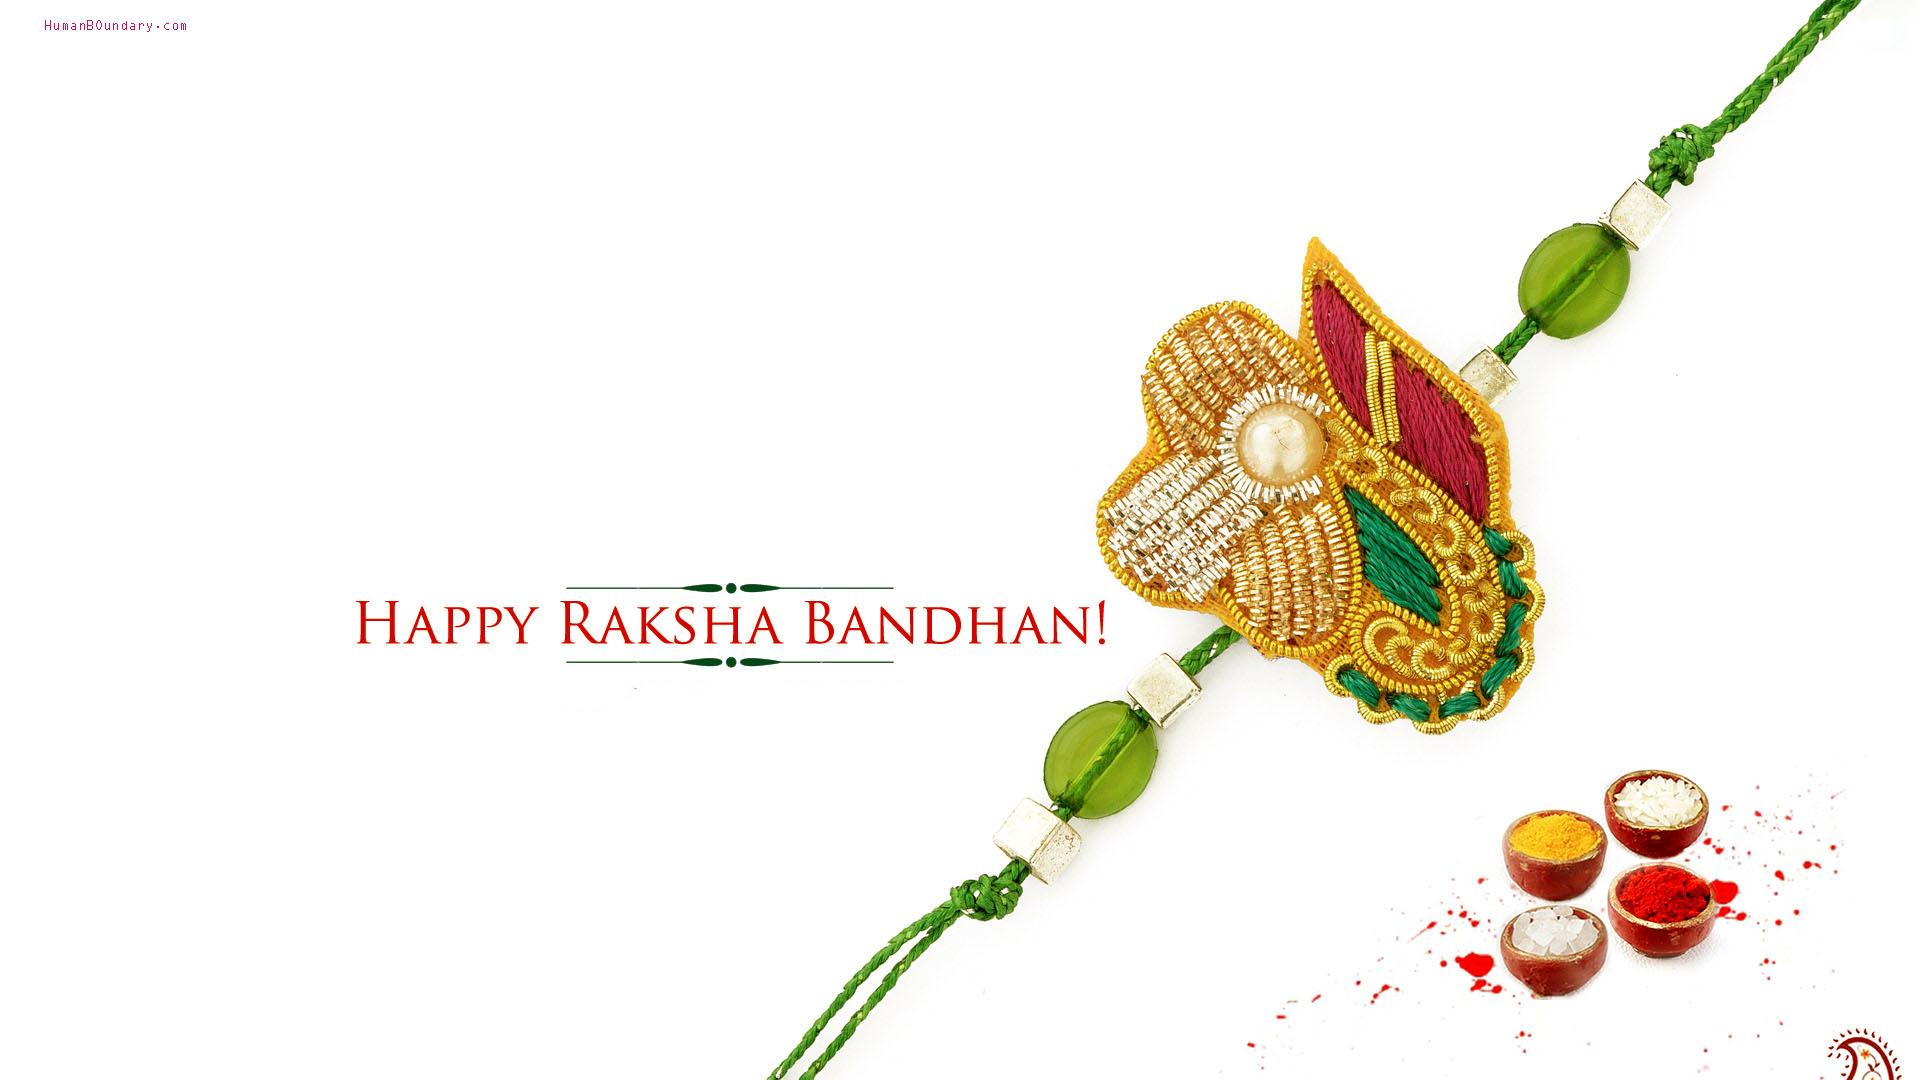 Happy Raksha Bandhan HD Images & Wallpapers Free Download